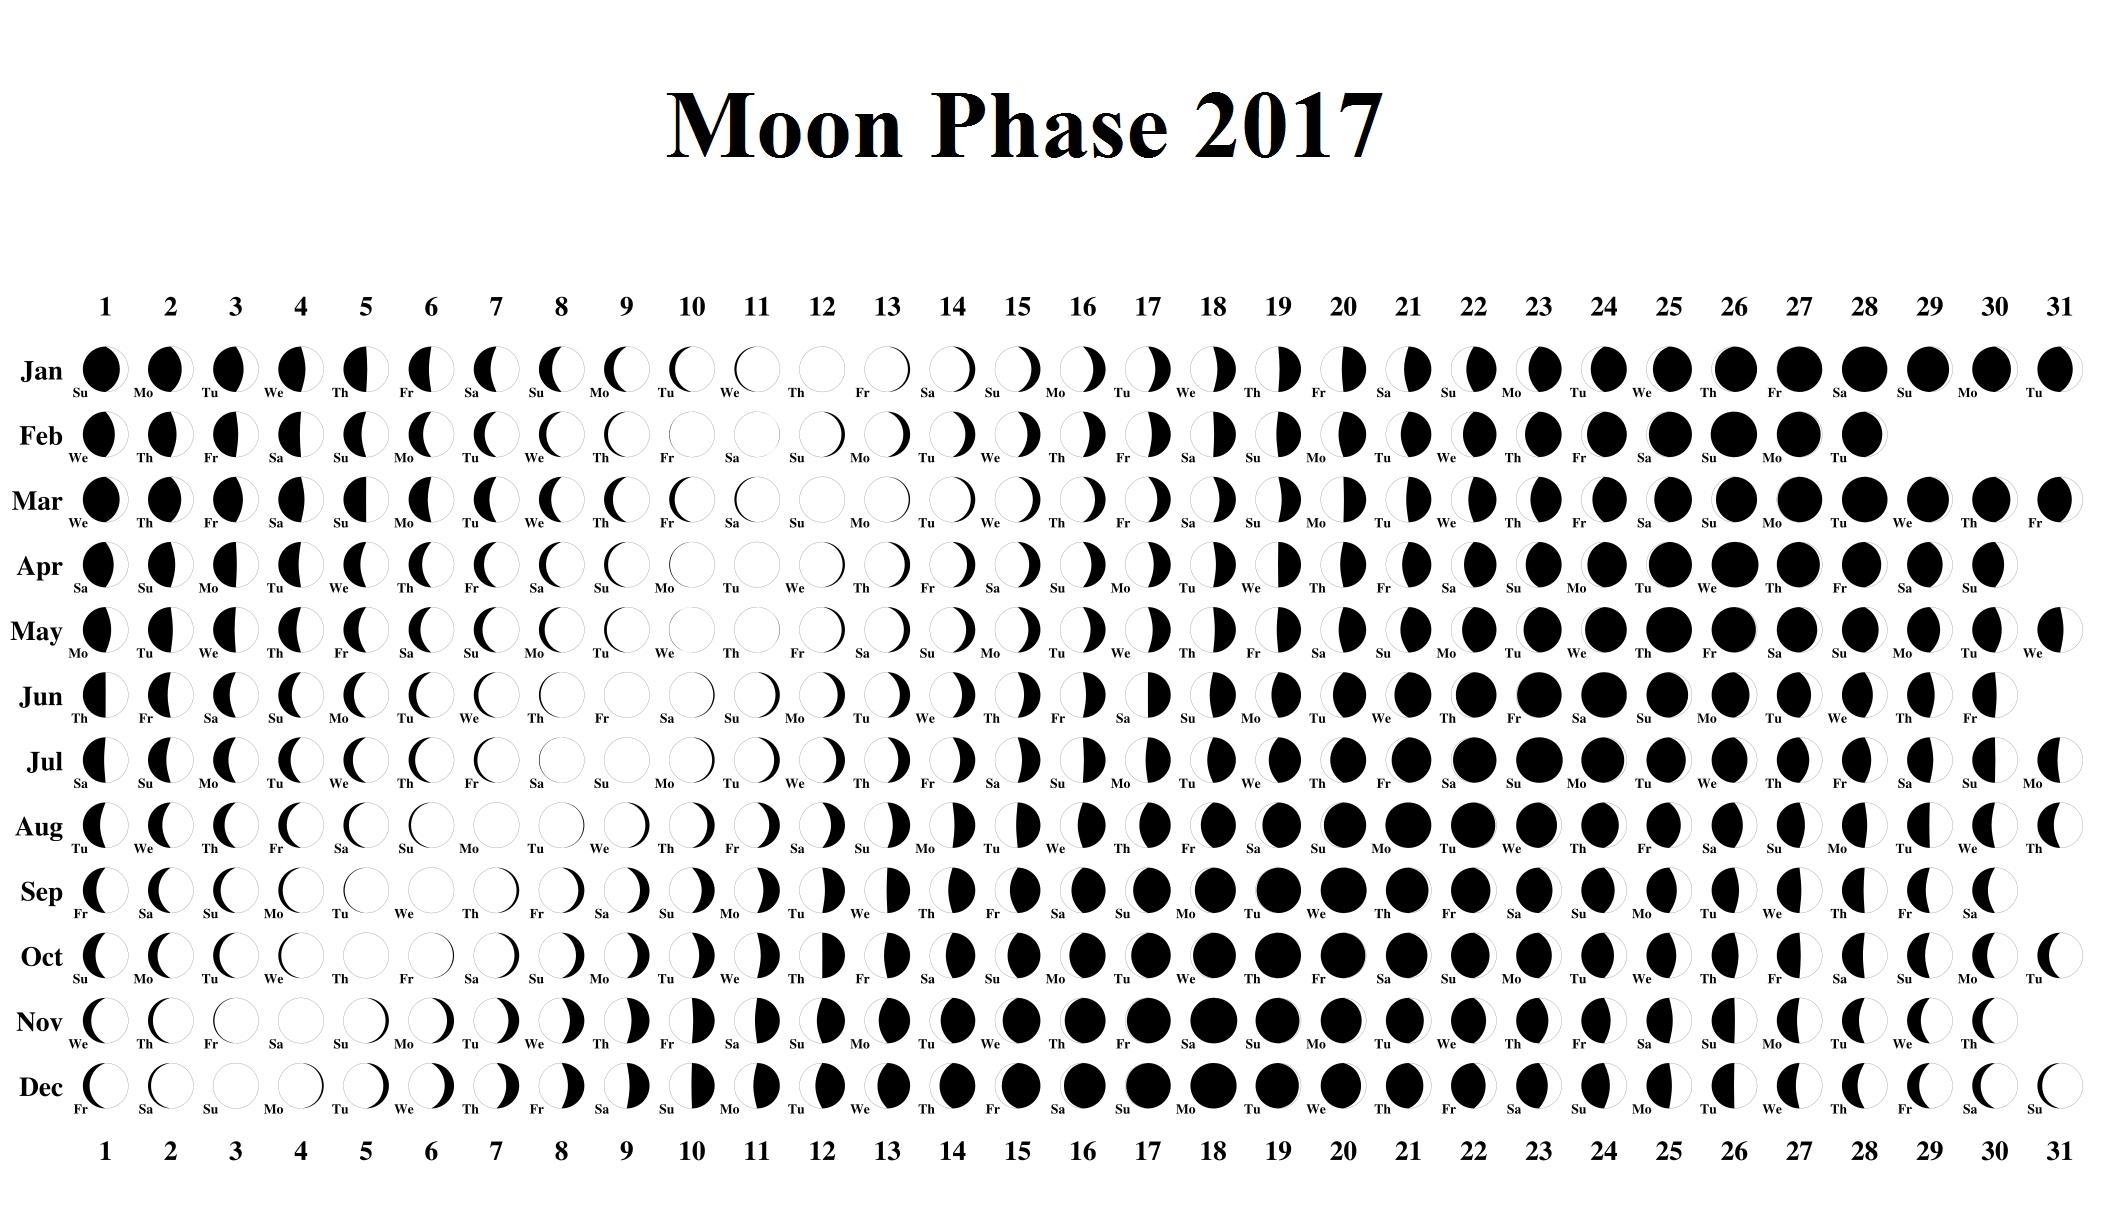 Moon Phase Calendar Lunar Template 2017 Moon Phase Calendar 2017  Xjb